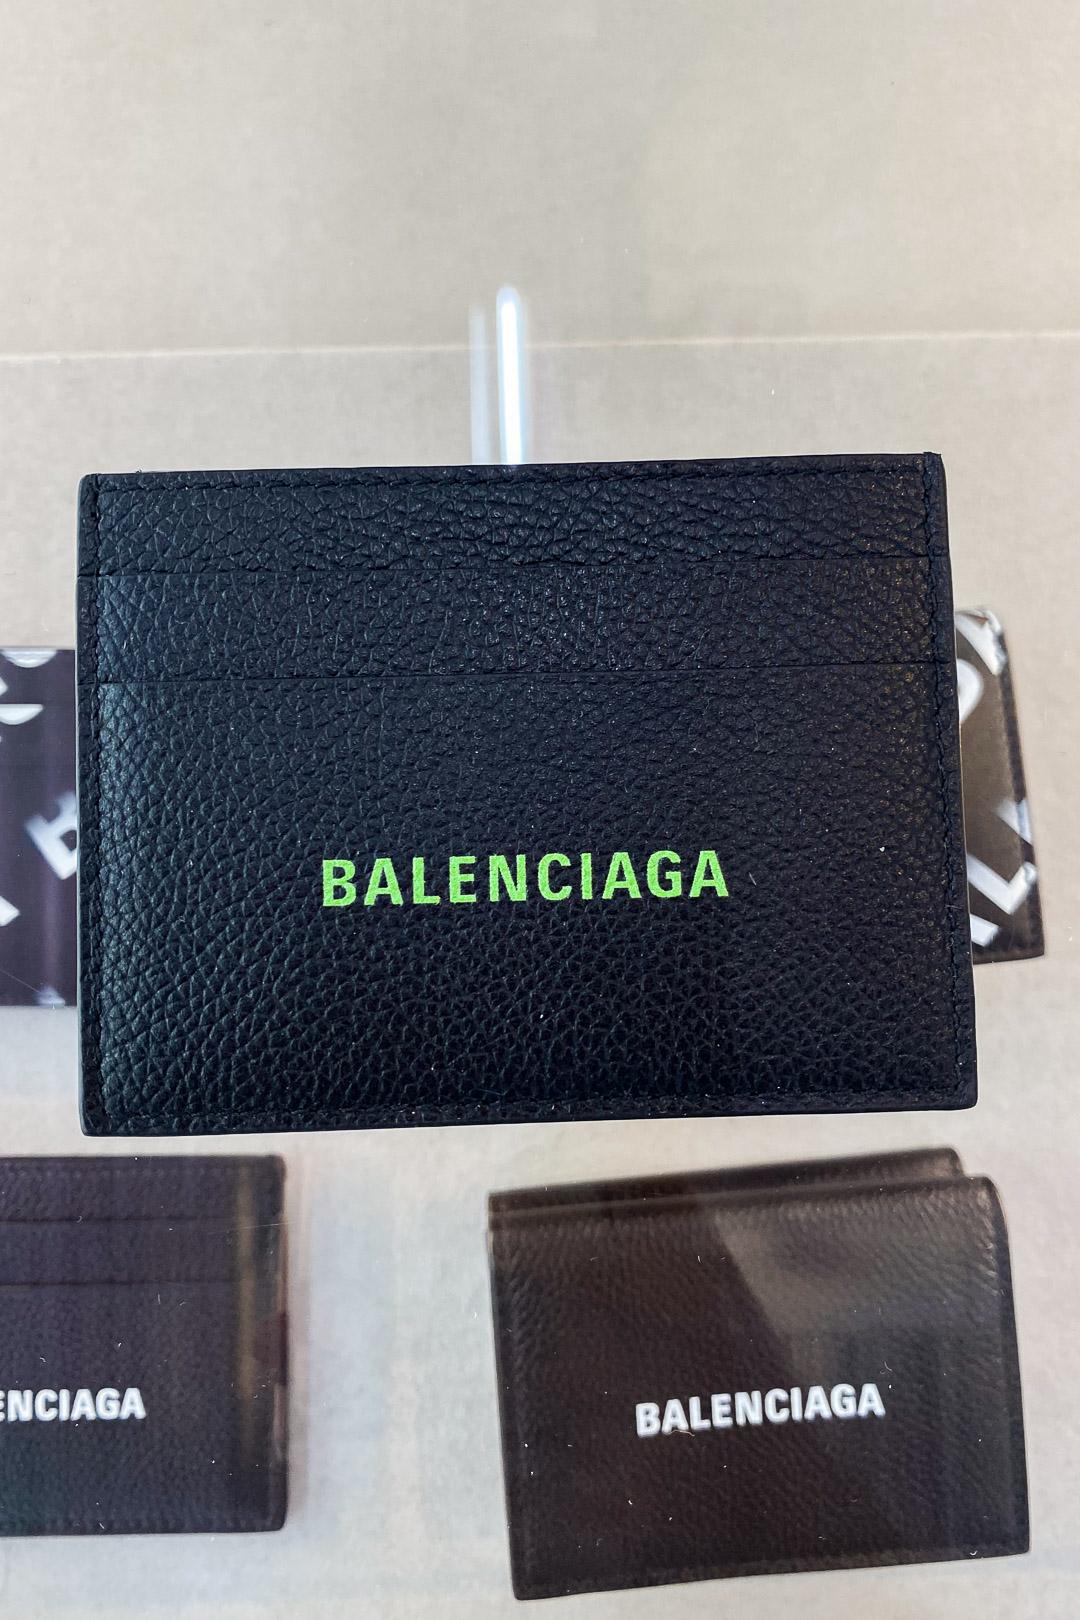 Balenciaga Men's Cash Card Holder in Green/Black